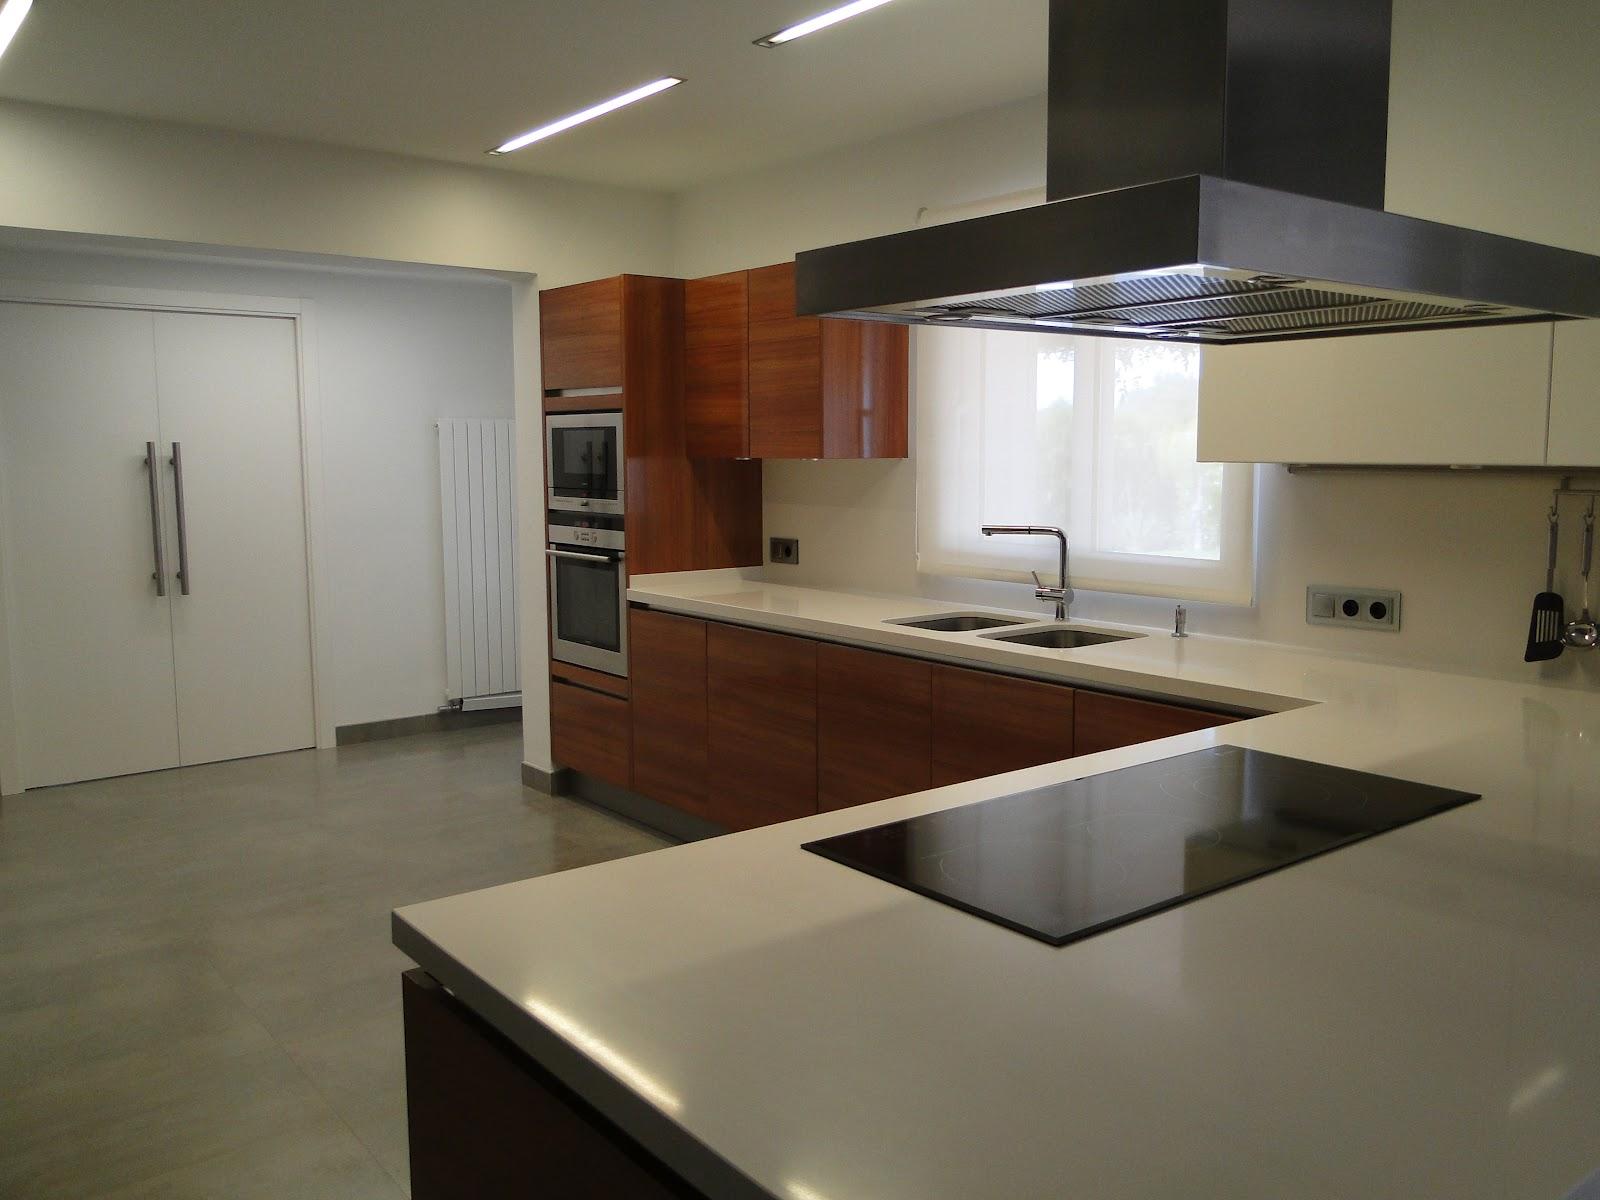 Planos low cost cocina con pen nsula - Cocinas con peninsula ...